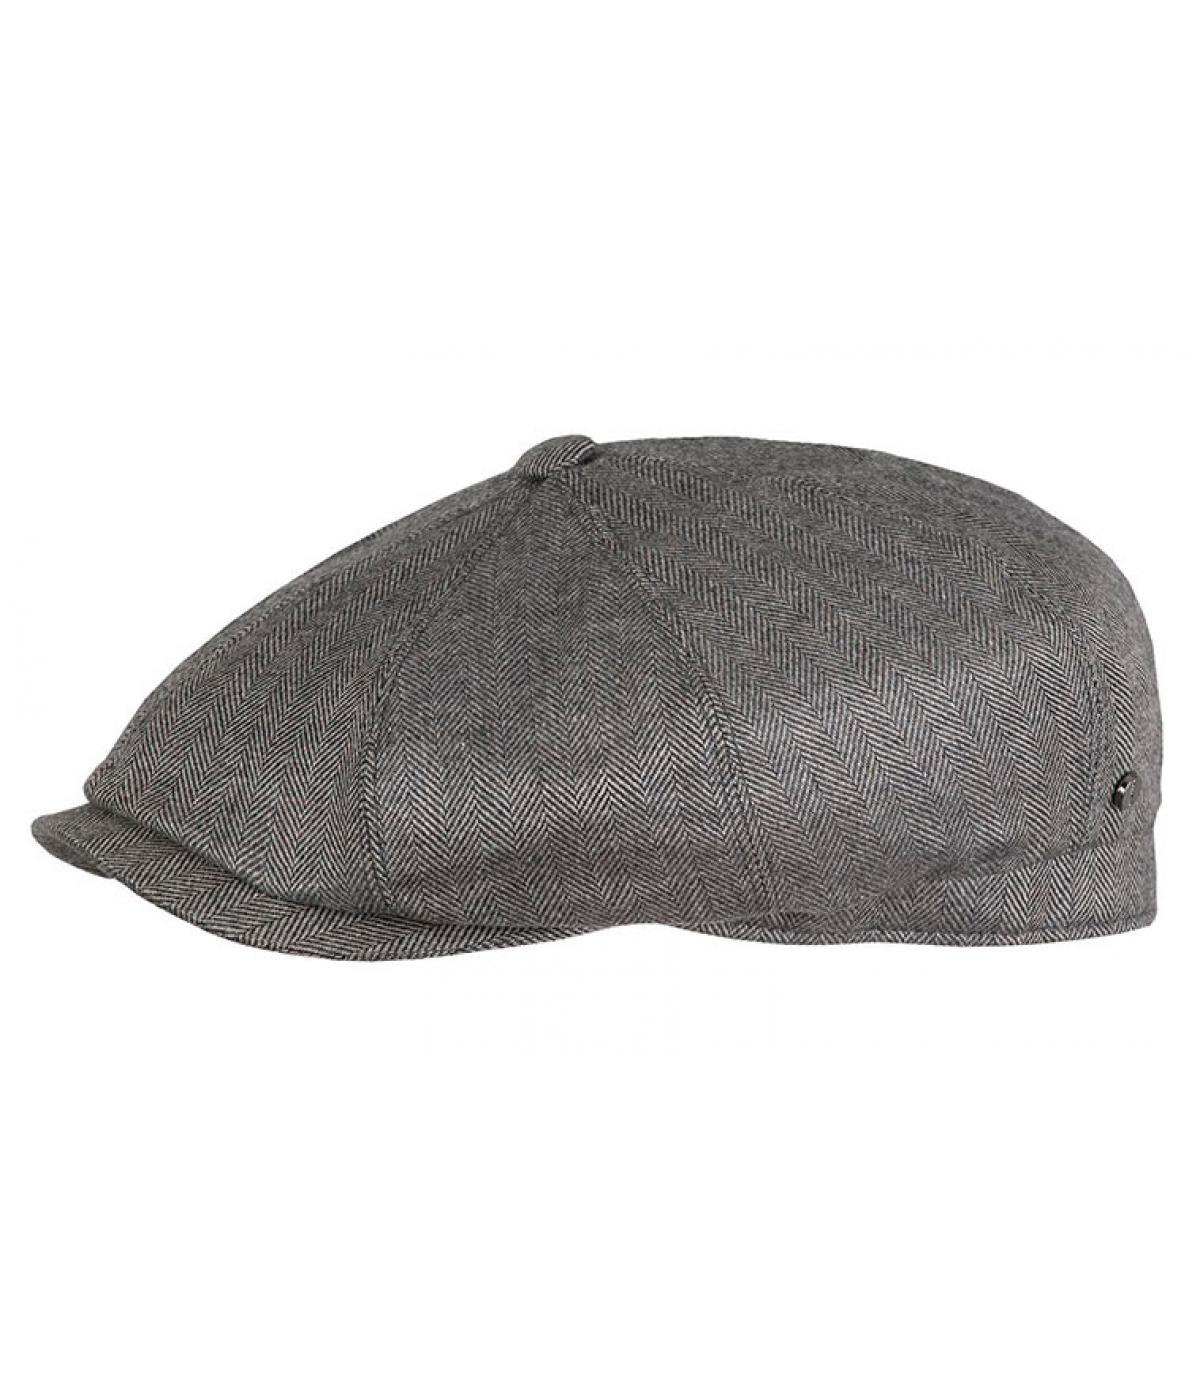 Barett grau Wolle Seide